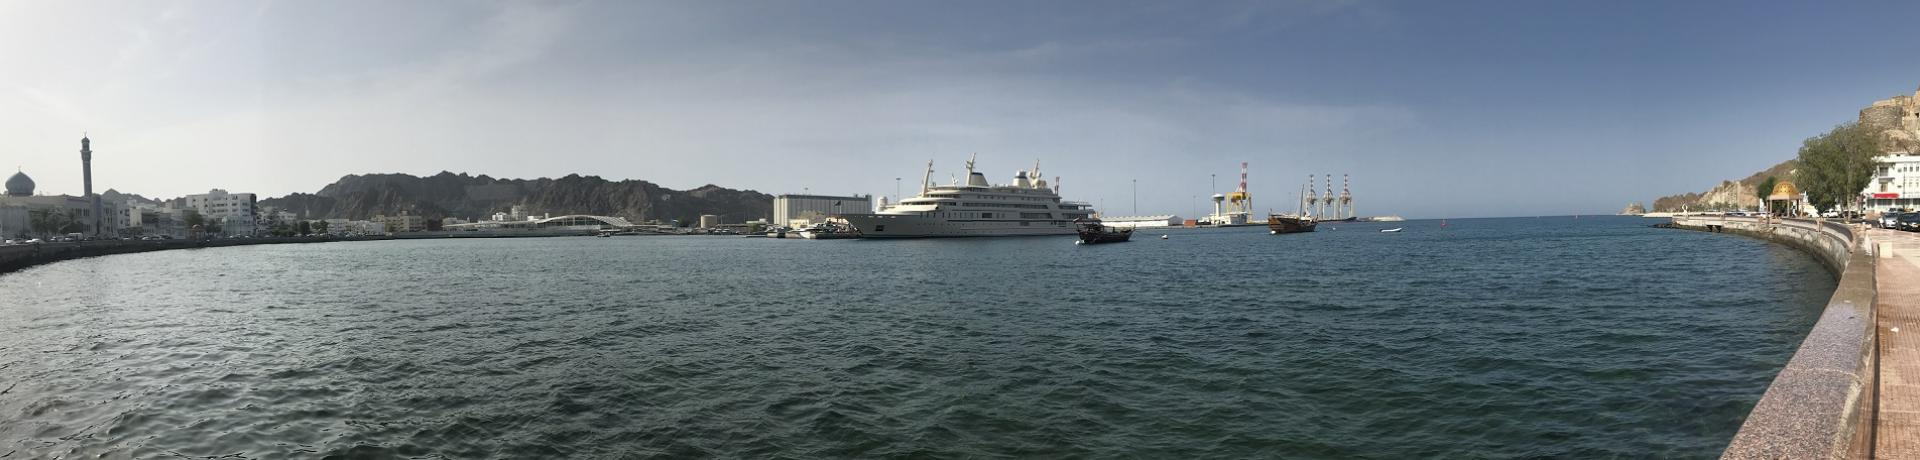 Oman: Muscat - Hafen - Emotion